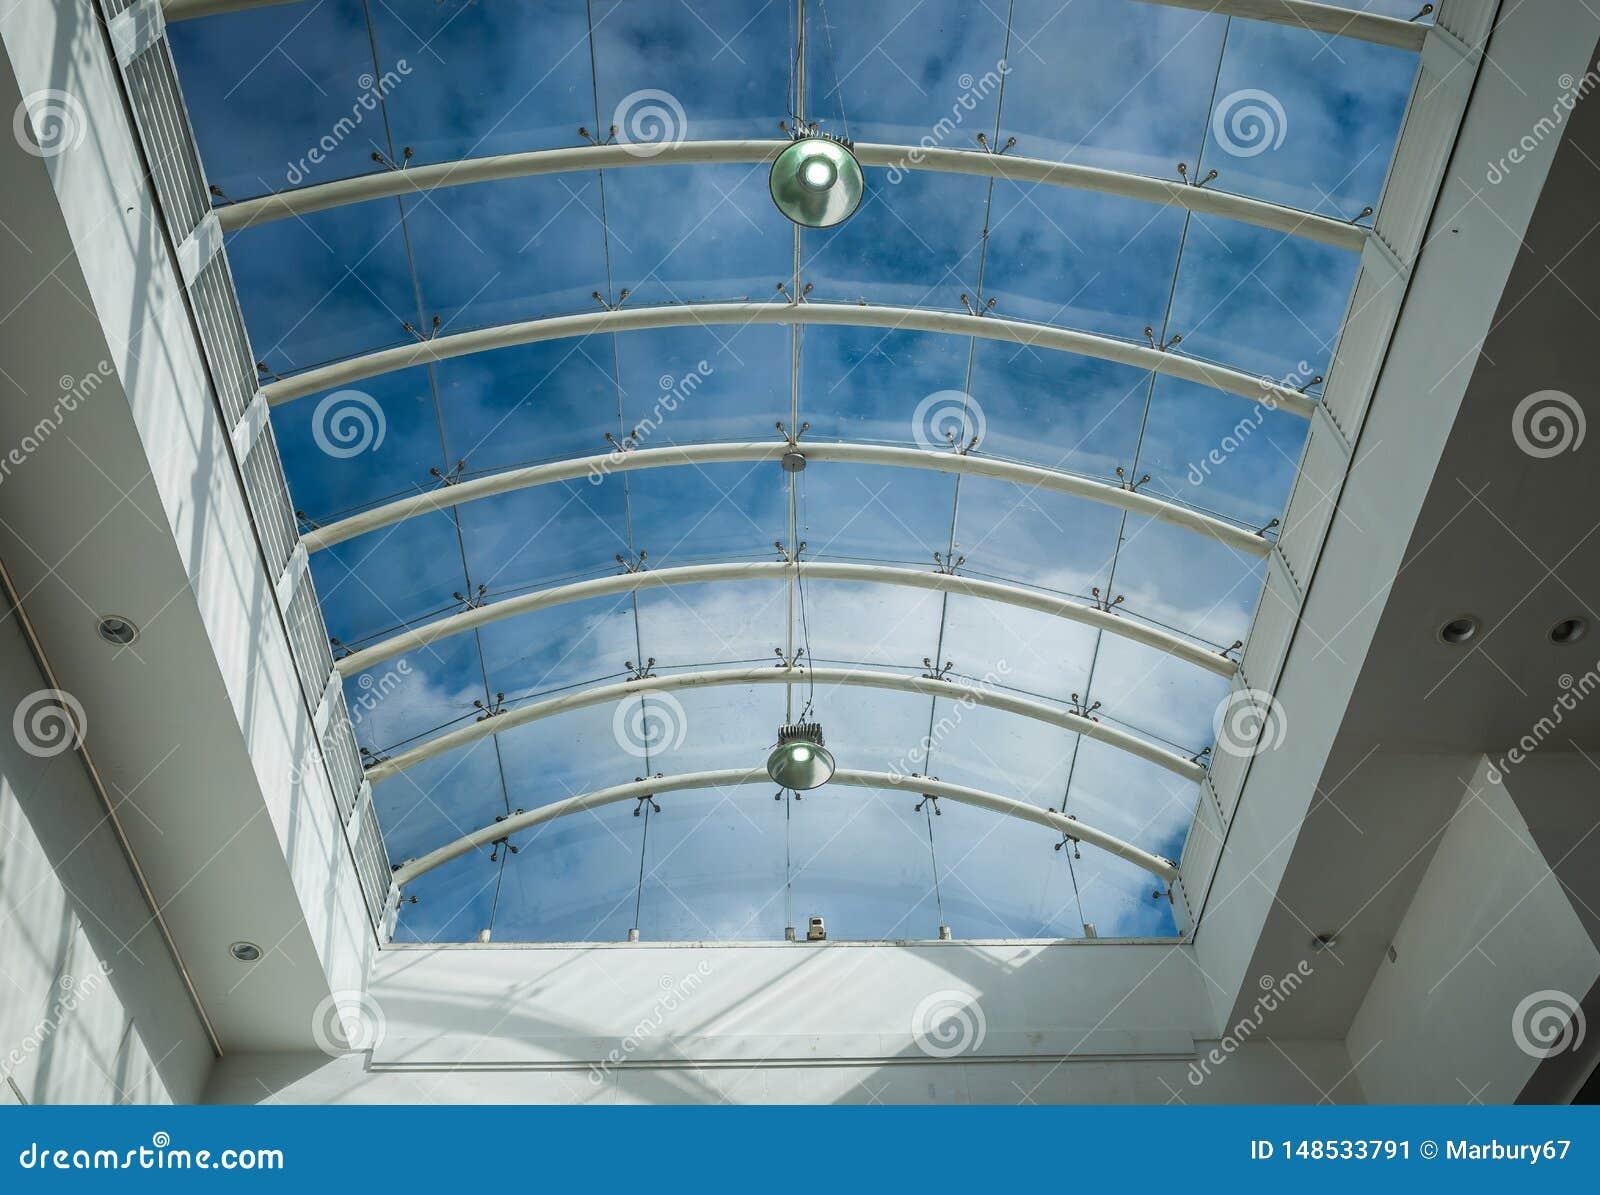 Glass Ceiling Skylight Stock Image Image Of Blue Design 148533791